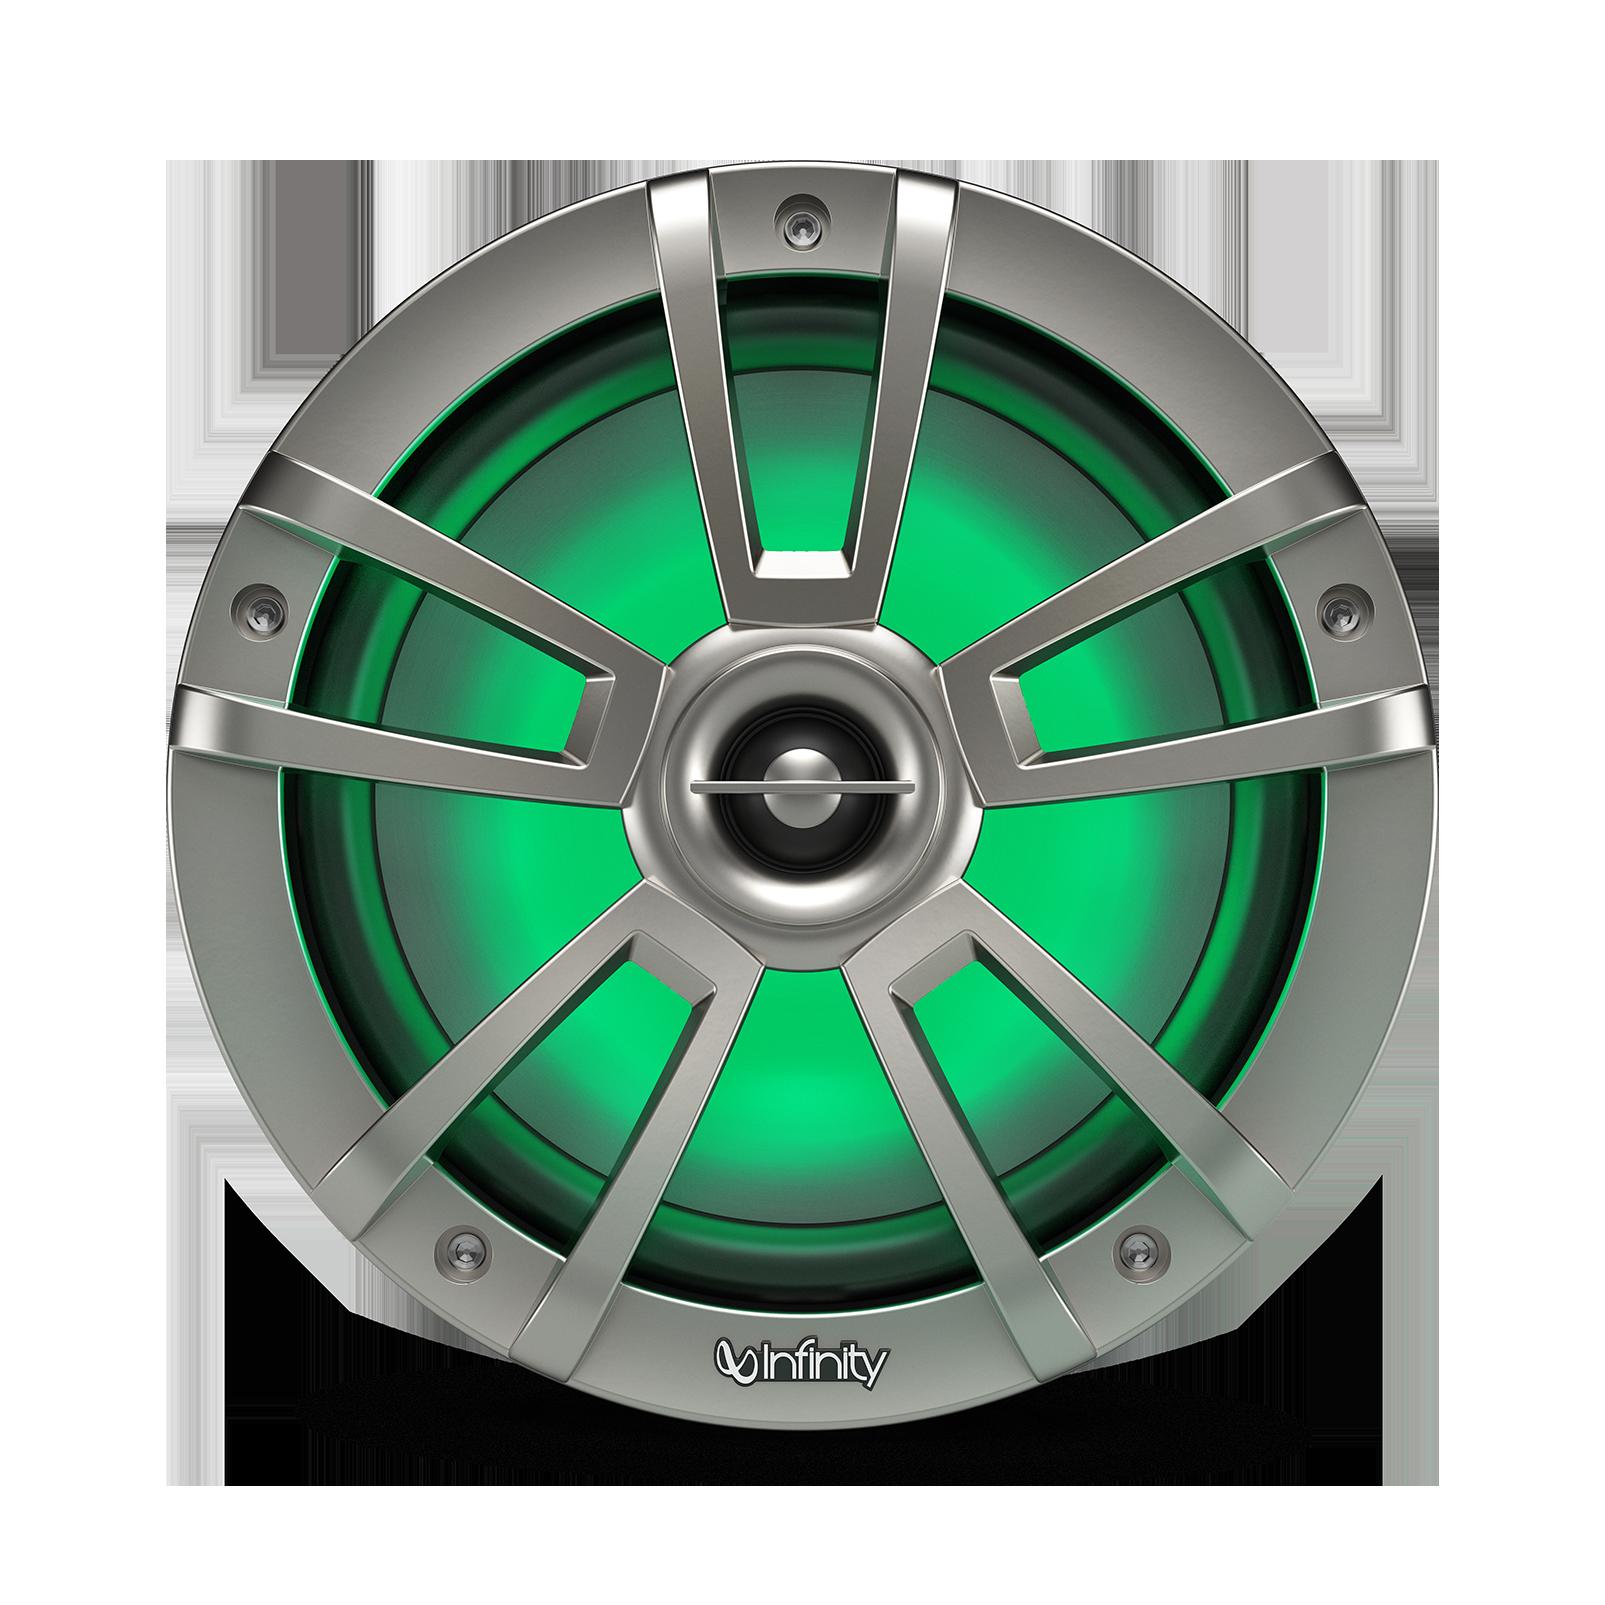 "Reference 822MLT - Graphite - Reference 822MLT—8"" (200mm) two-way marine audio multi-element speaker – titanium - Detailshot 1"